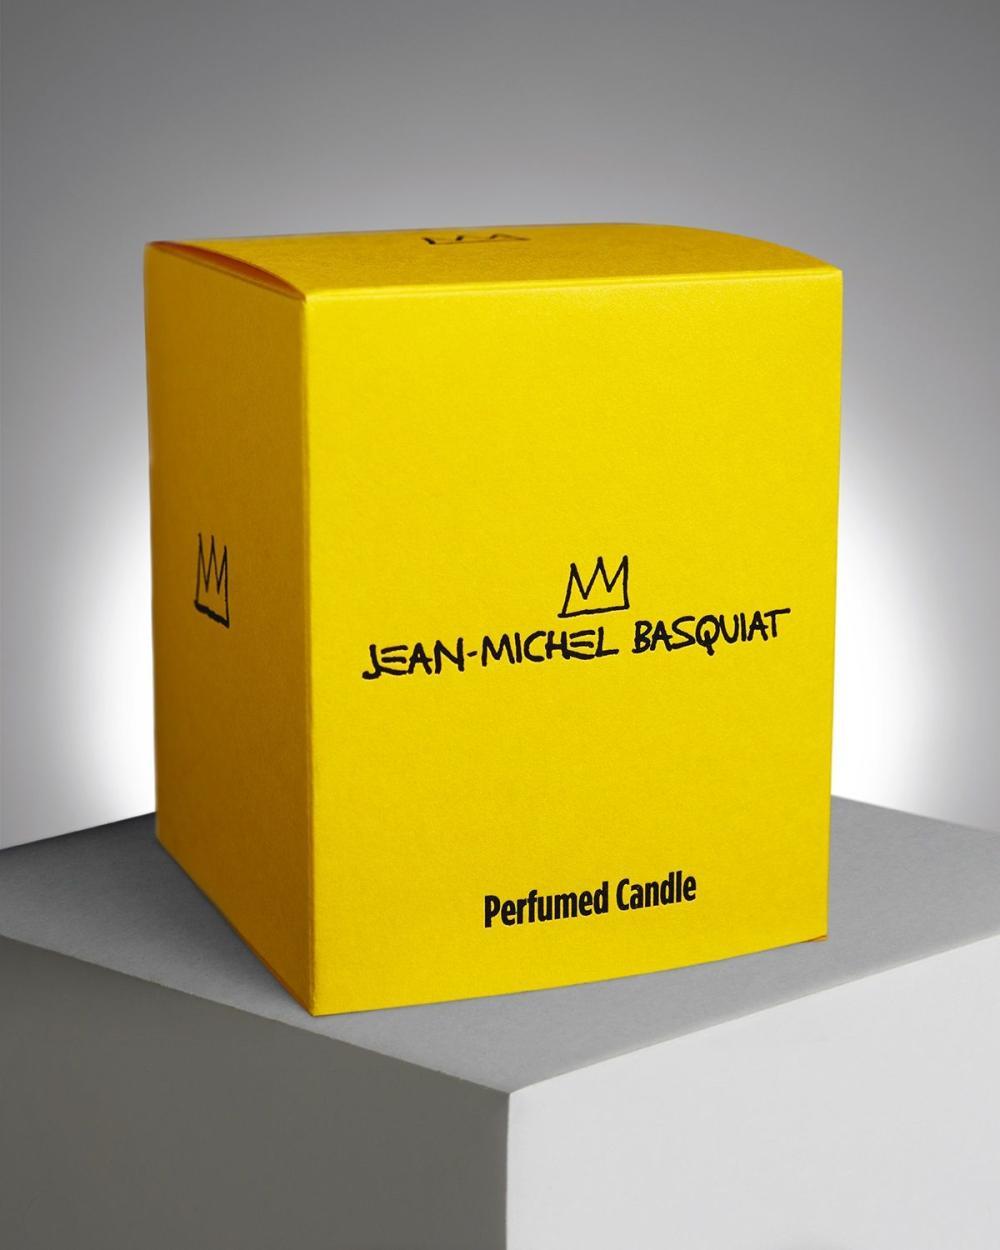 Jean-Michel Basquiat (after) - Versus Perfumed Candle